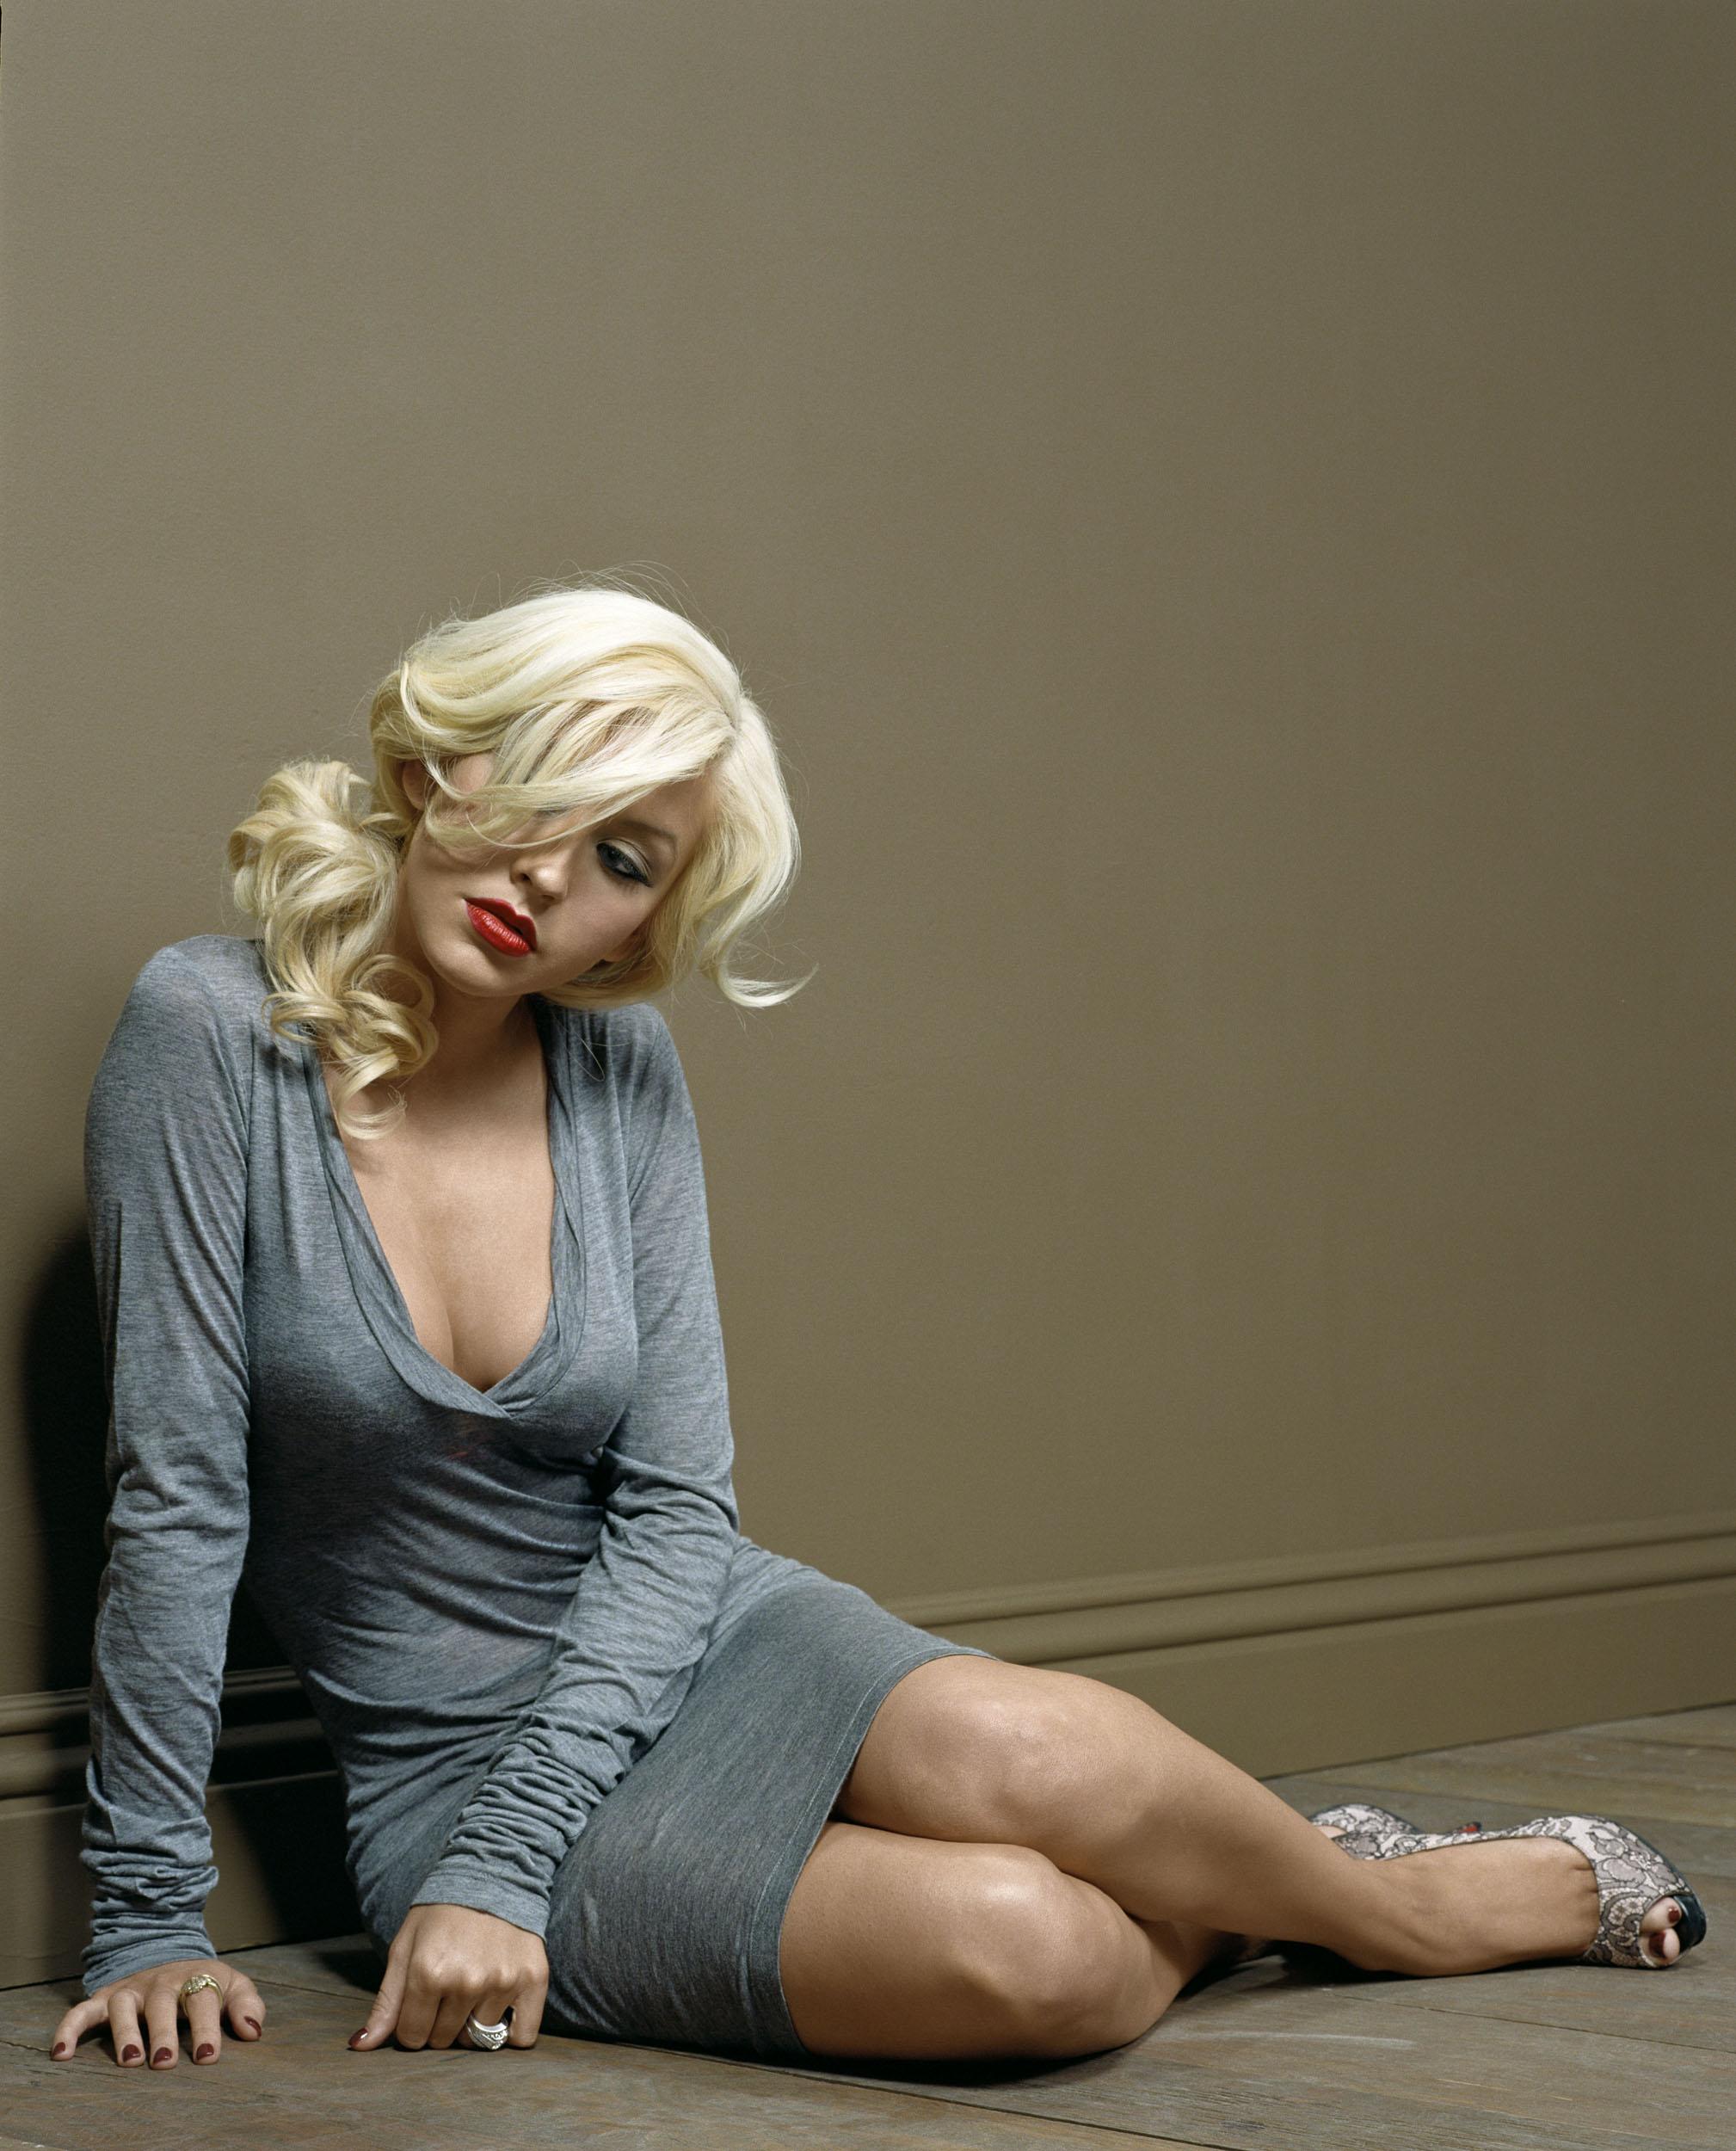 Christinan Aguilera